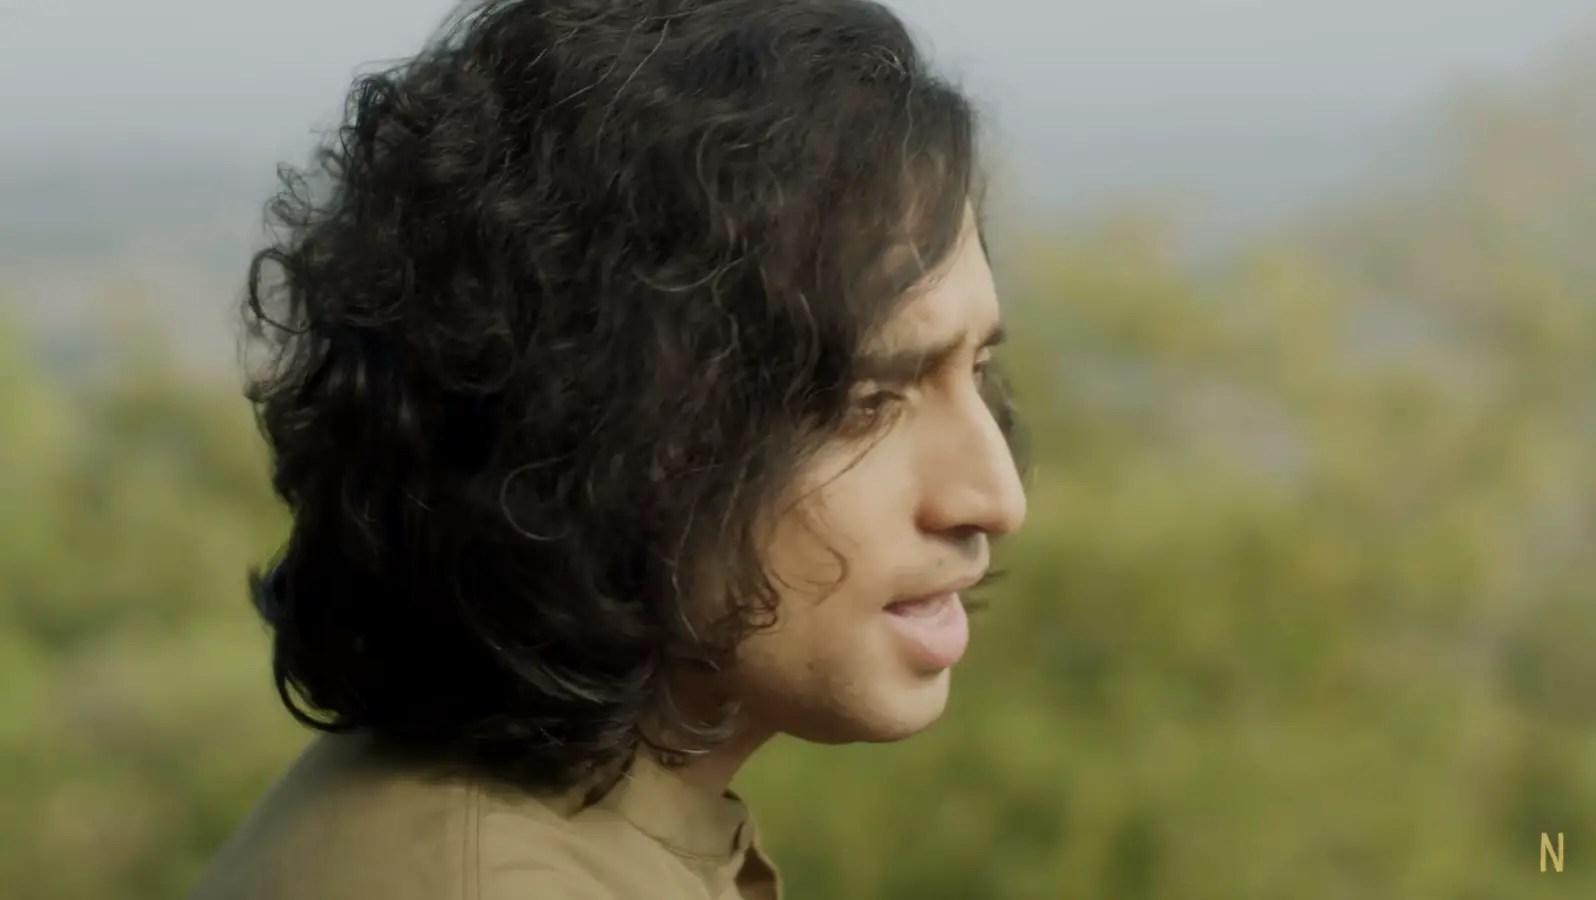 Silver and Gold - Nikhil D'Souza